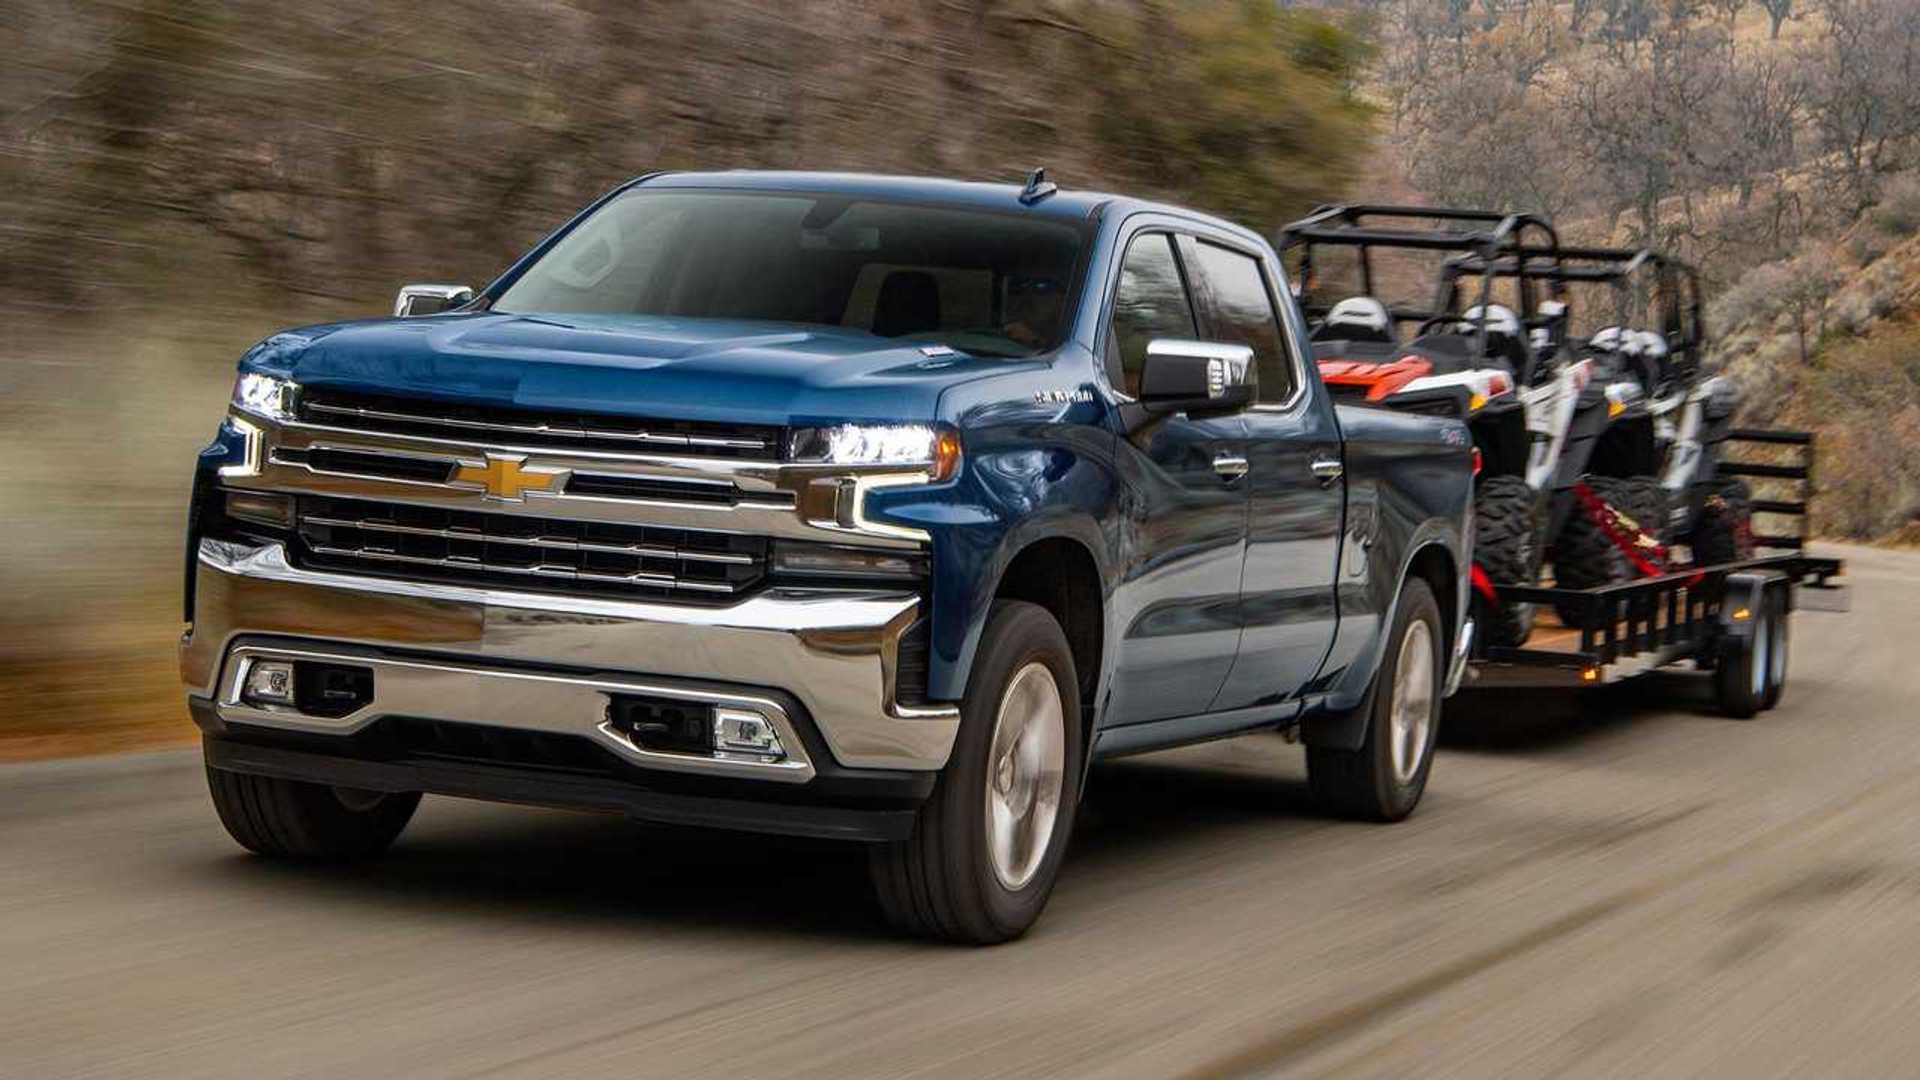 2021 Chevy Silverado And Gmc Sierra Diesels Get 1 500 Price Cut